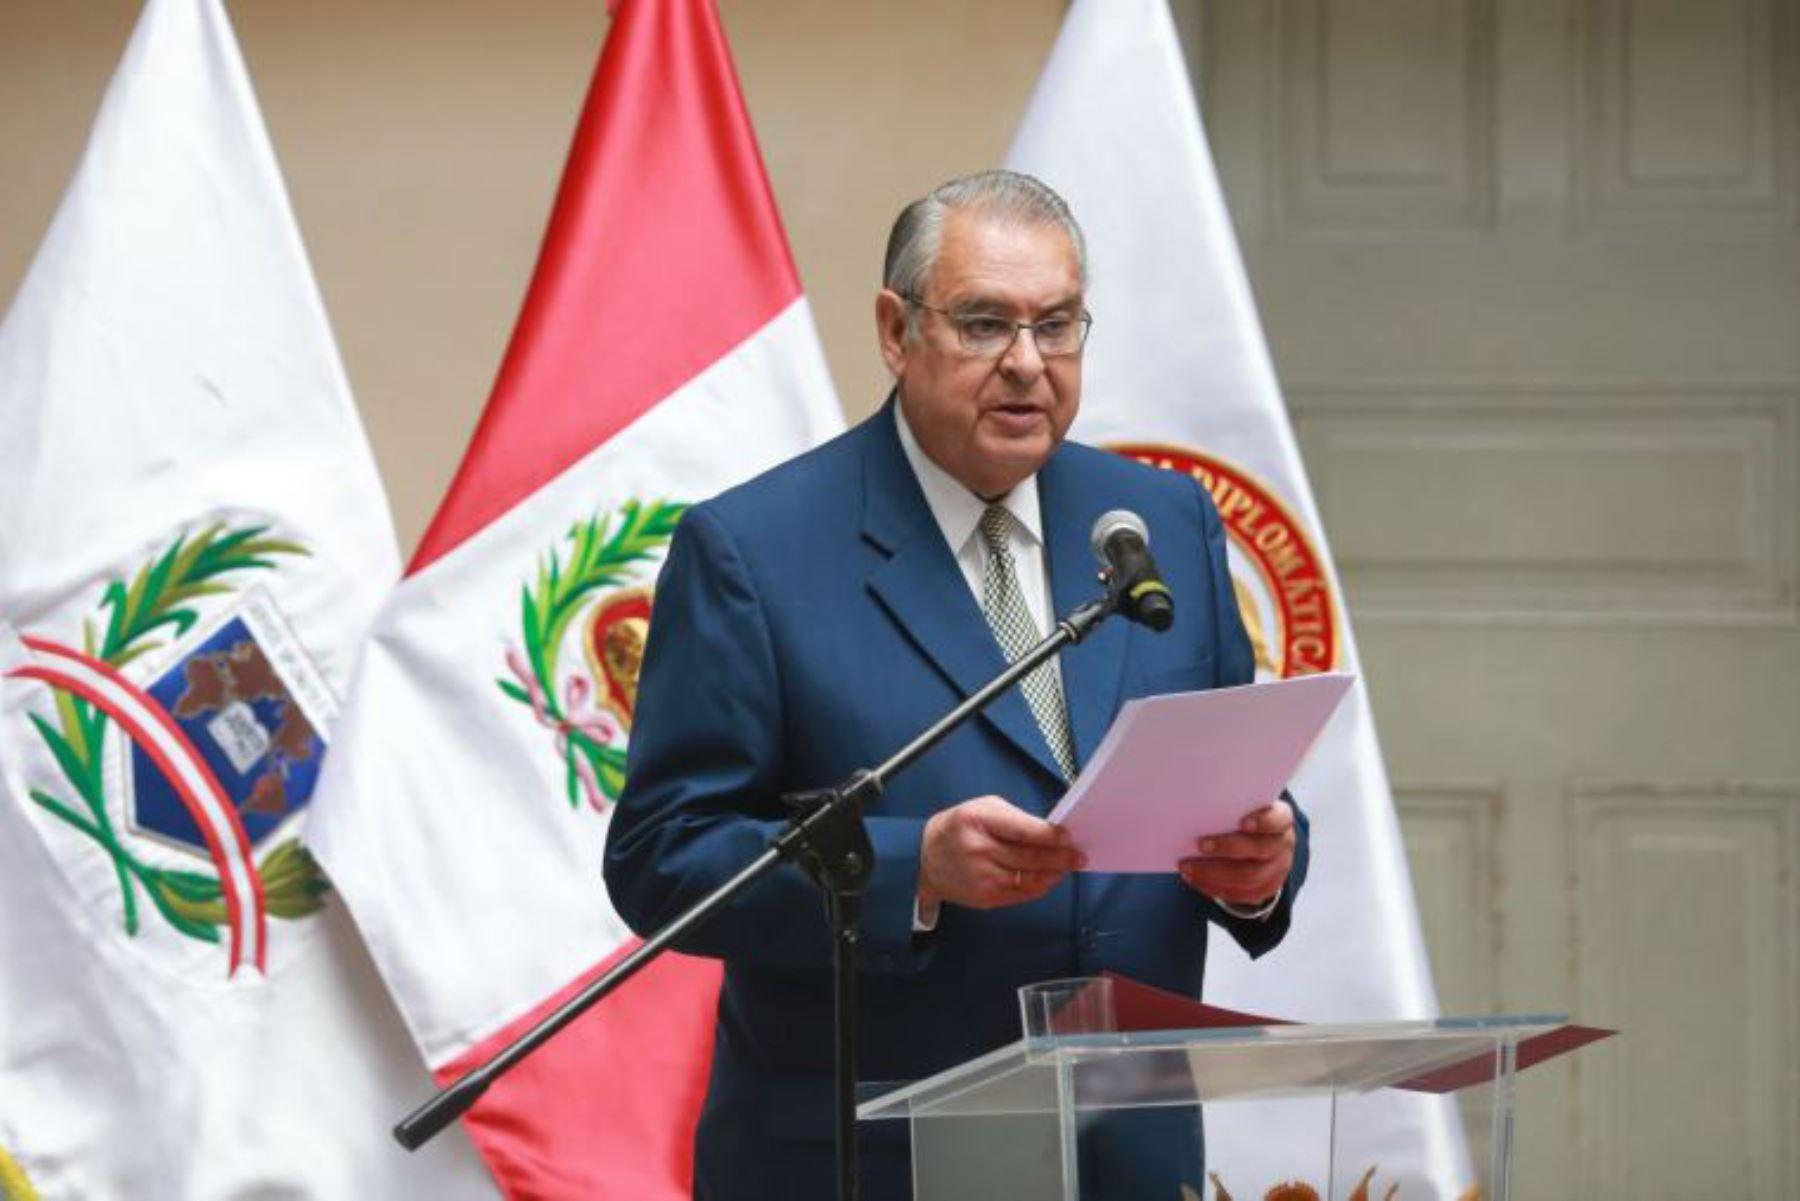 Canciller Allan Wagner saluda al presidente electo Pedro Castillo